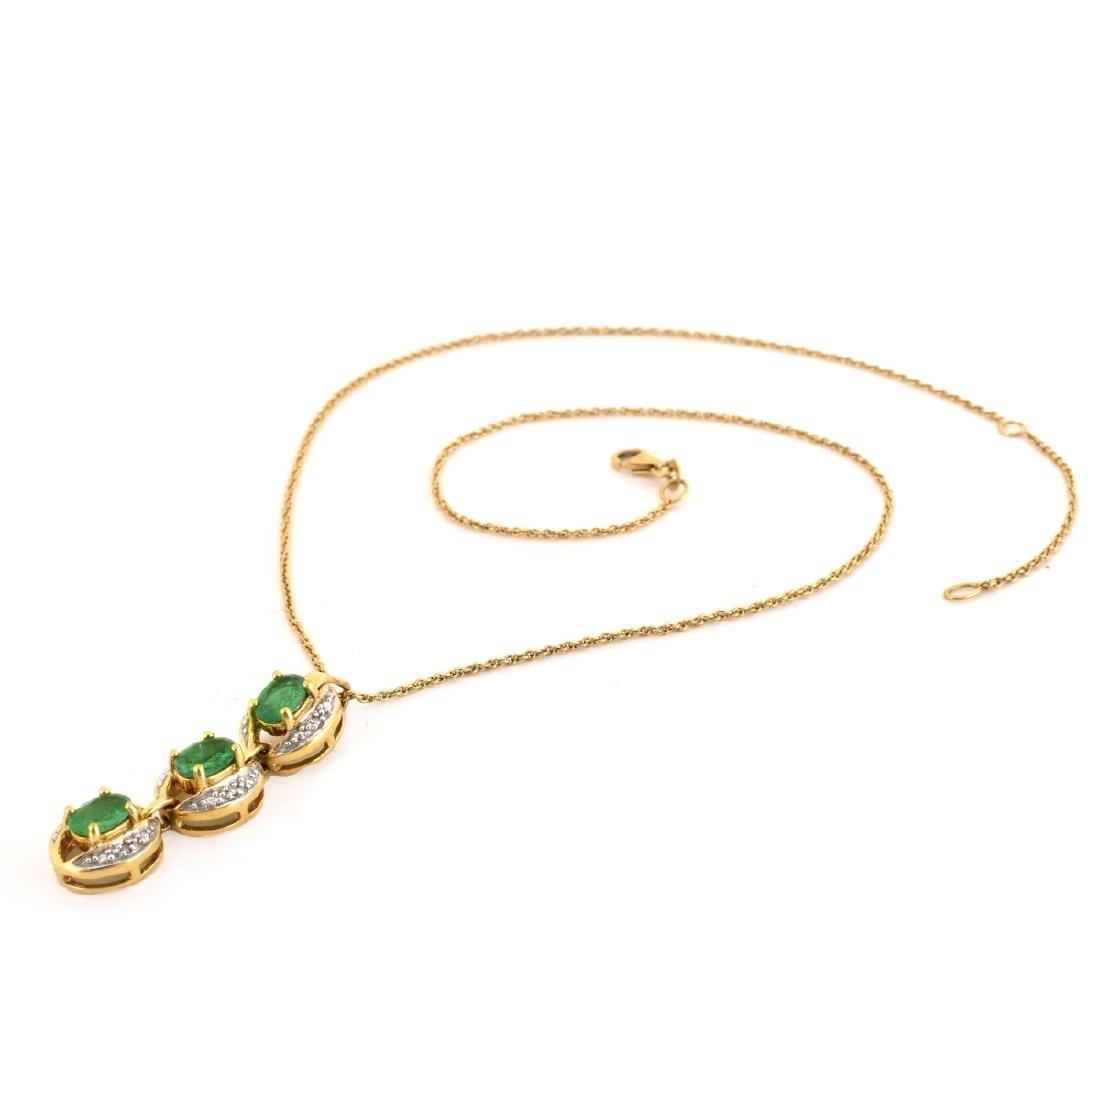 Emerald, Diamond and 18K Gold Pendant Necklace - 3